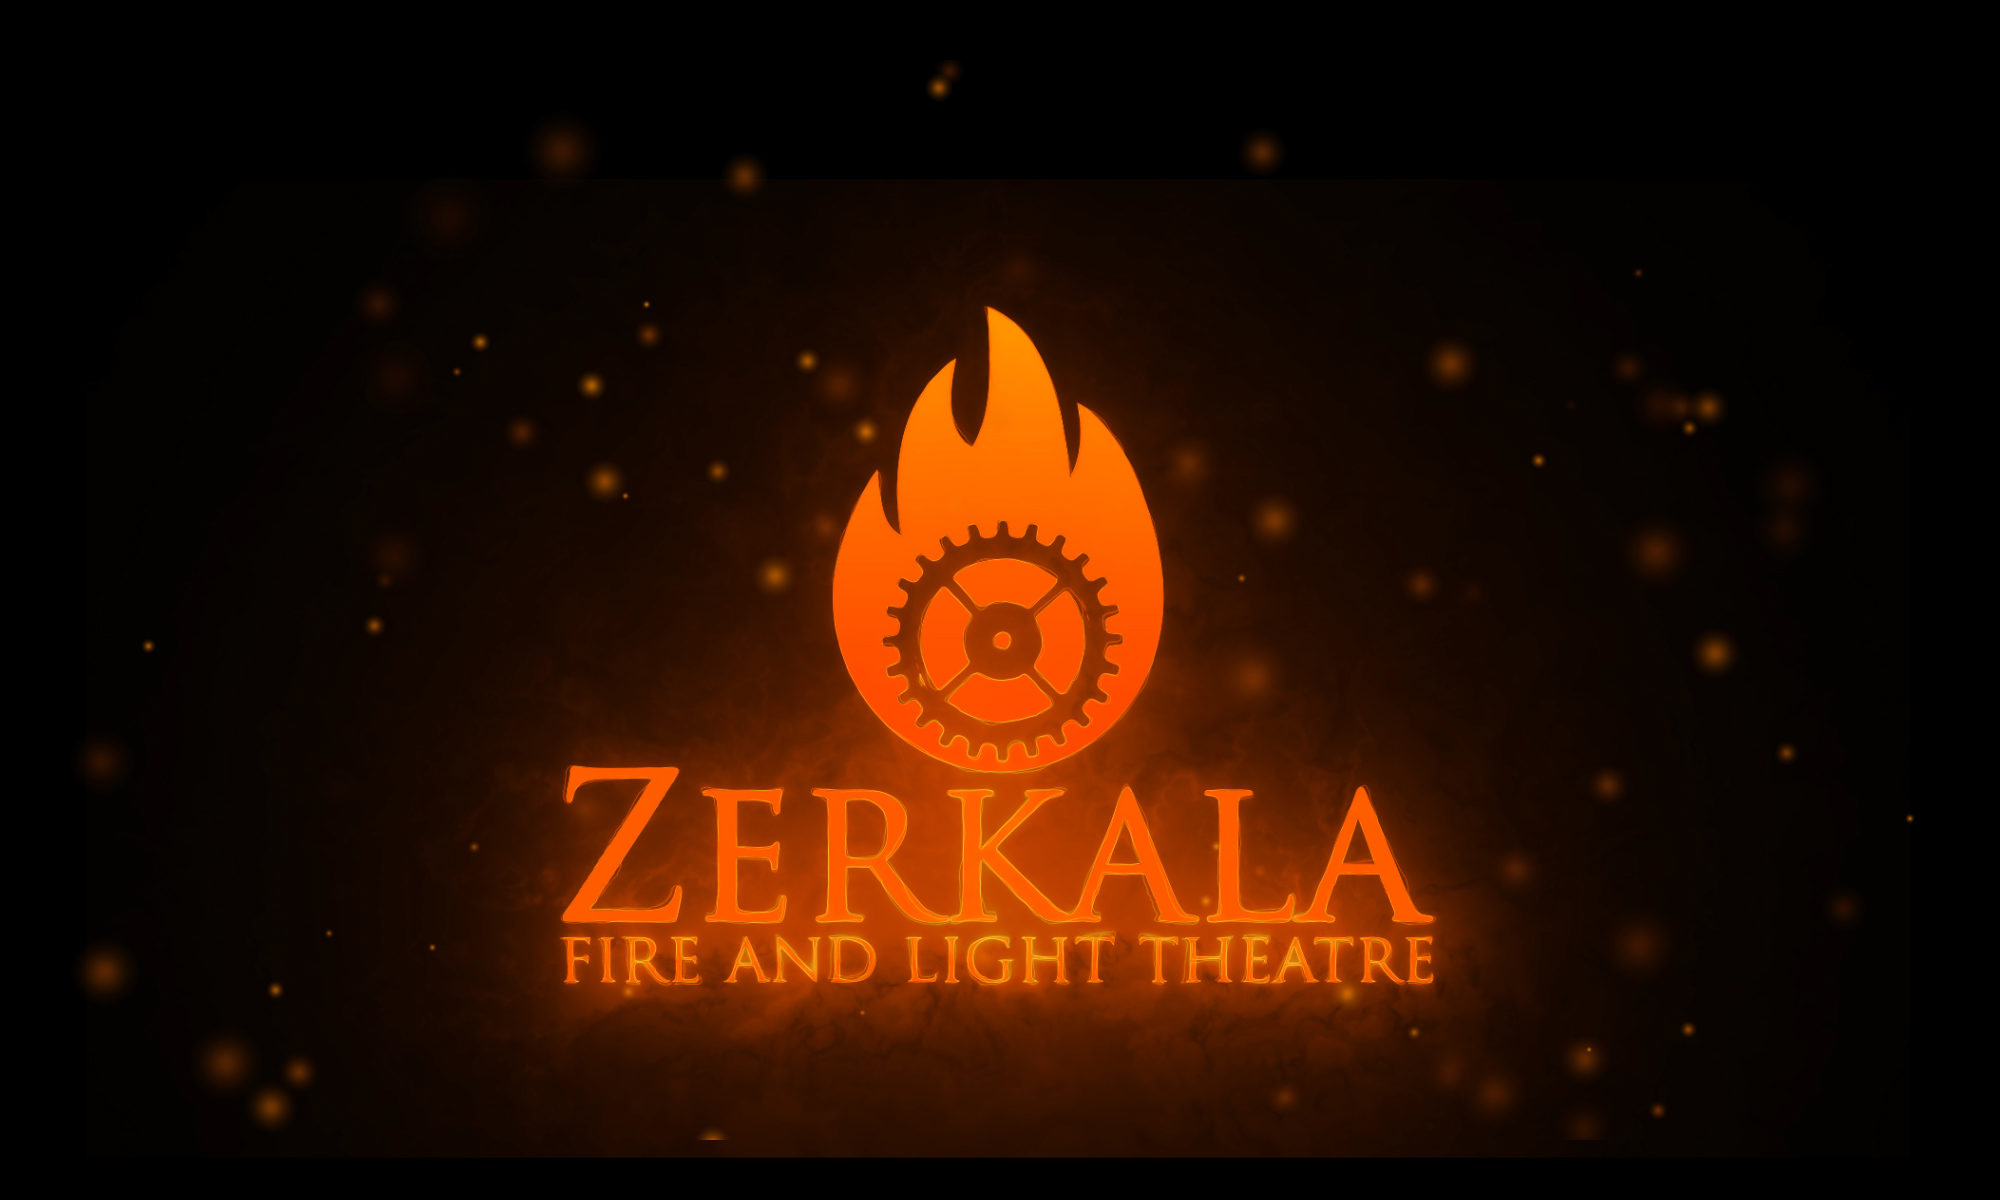 Zerkala